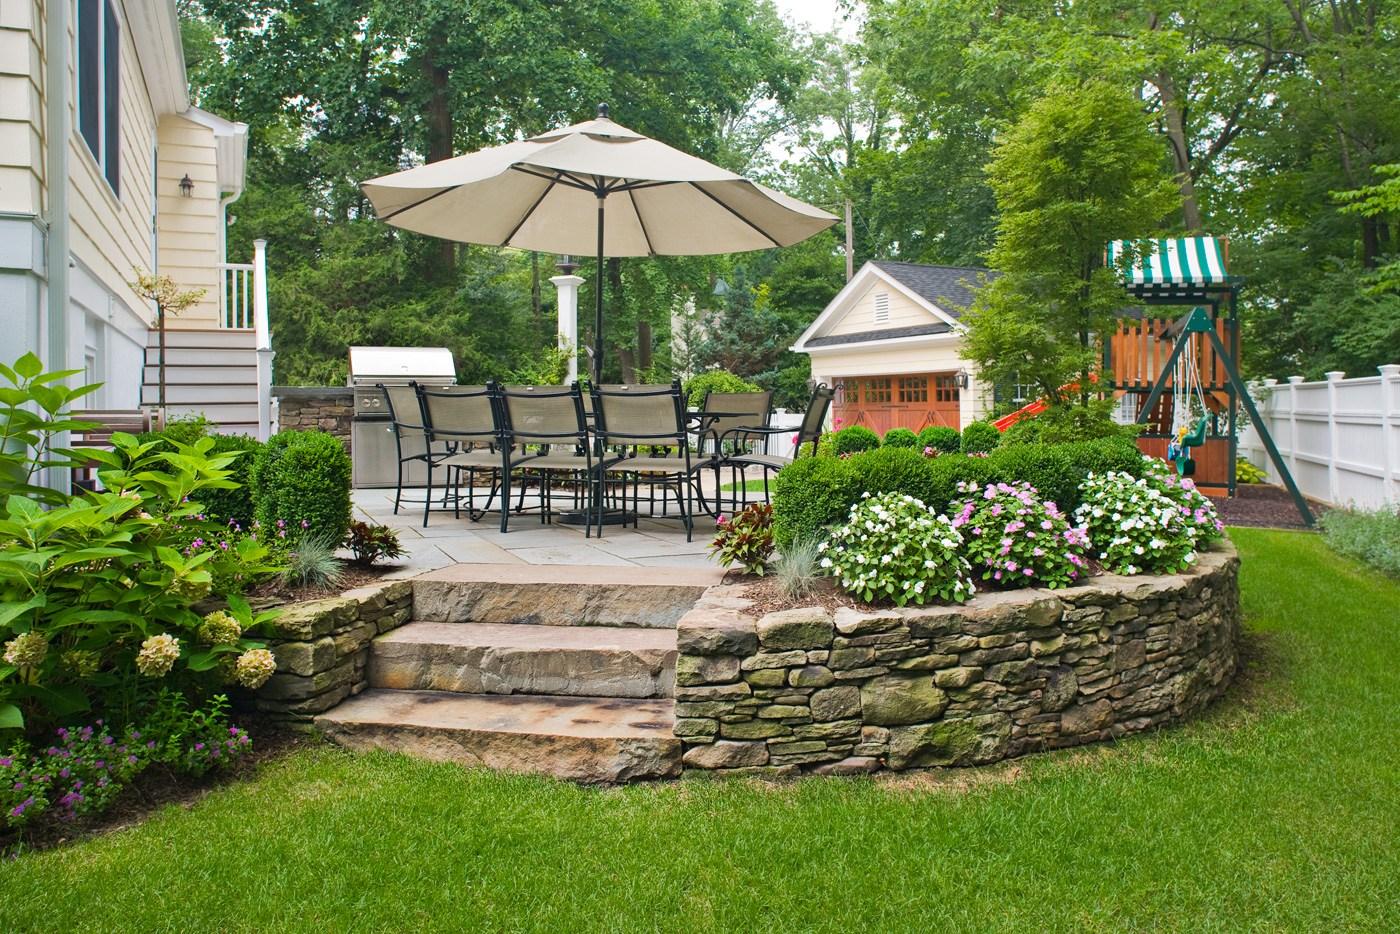 Bluestone Steps Cording Landscape Design | Patio With Steps To Garden | Sl*P* | Pinterest | Lighting | Balustrade | Contemporary